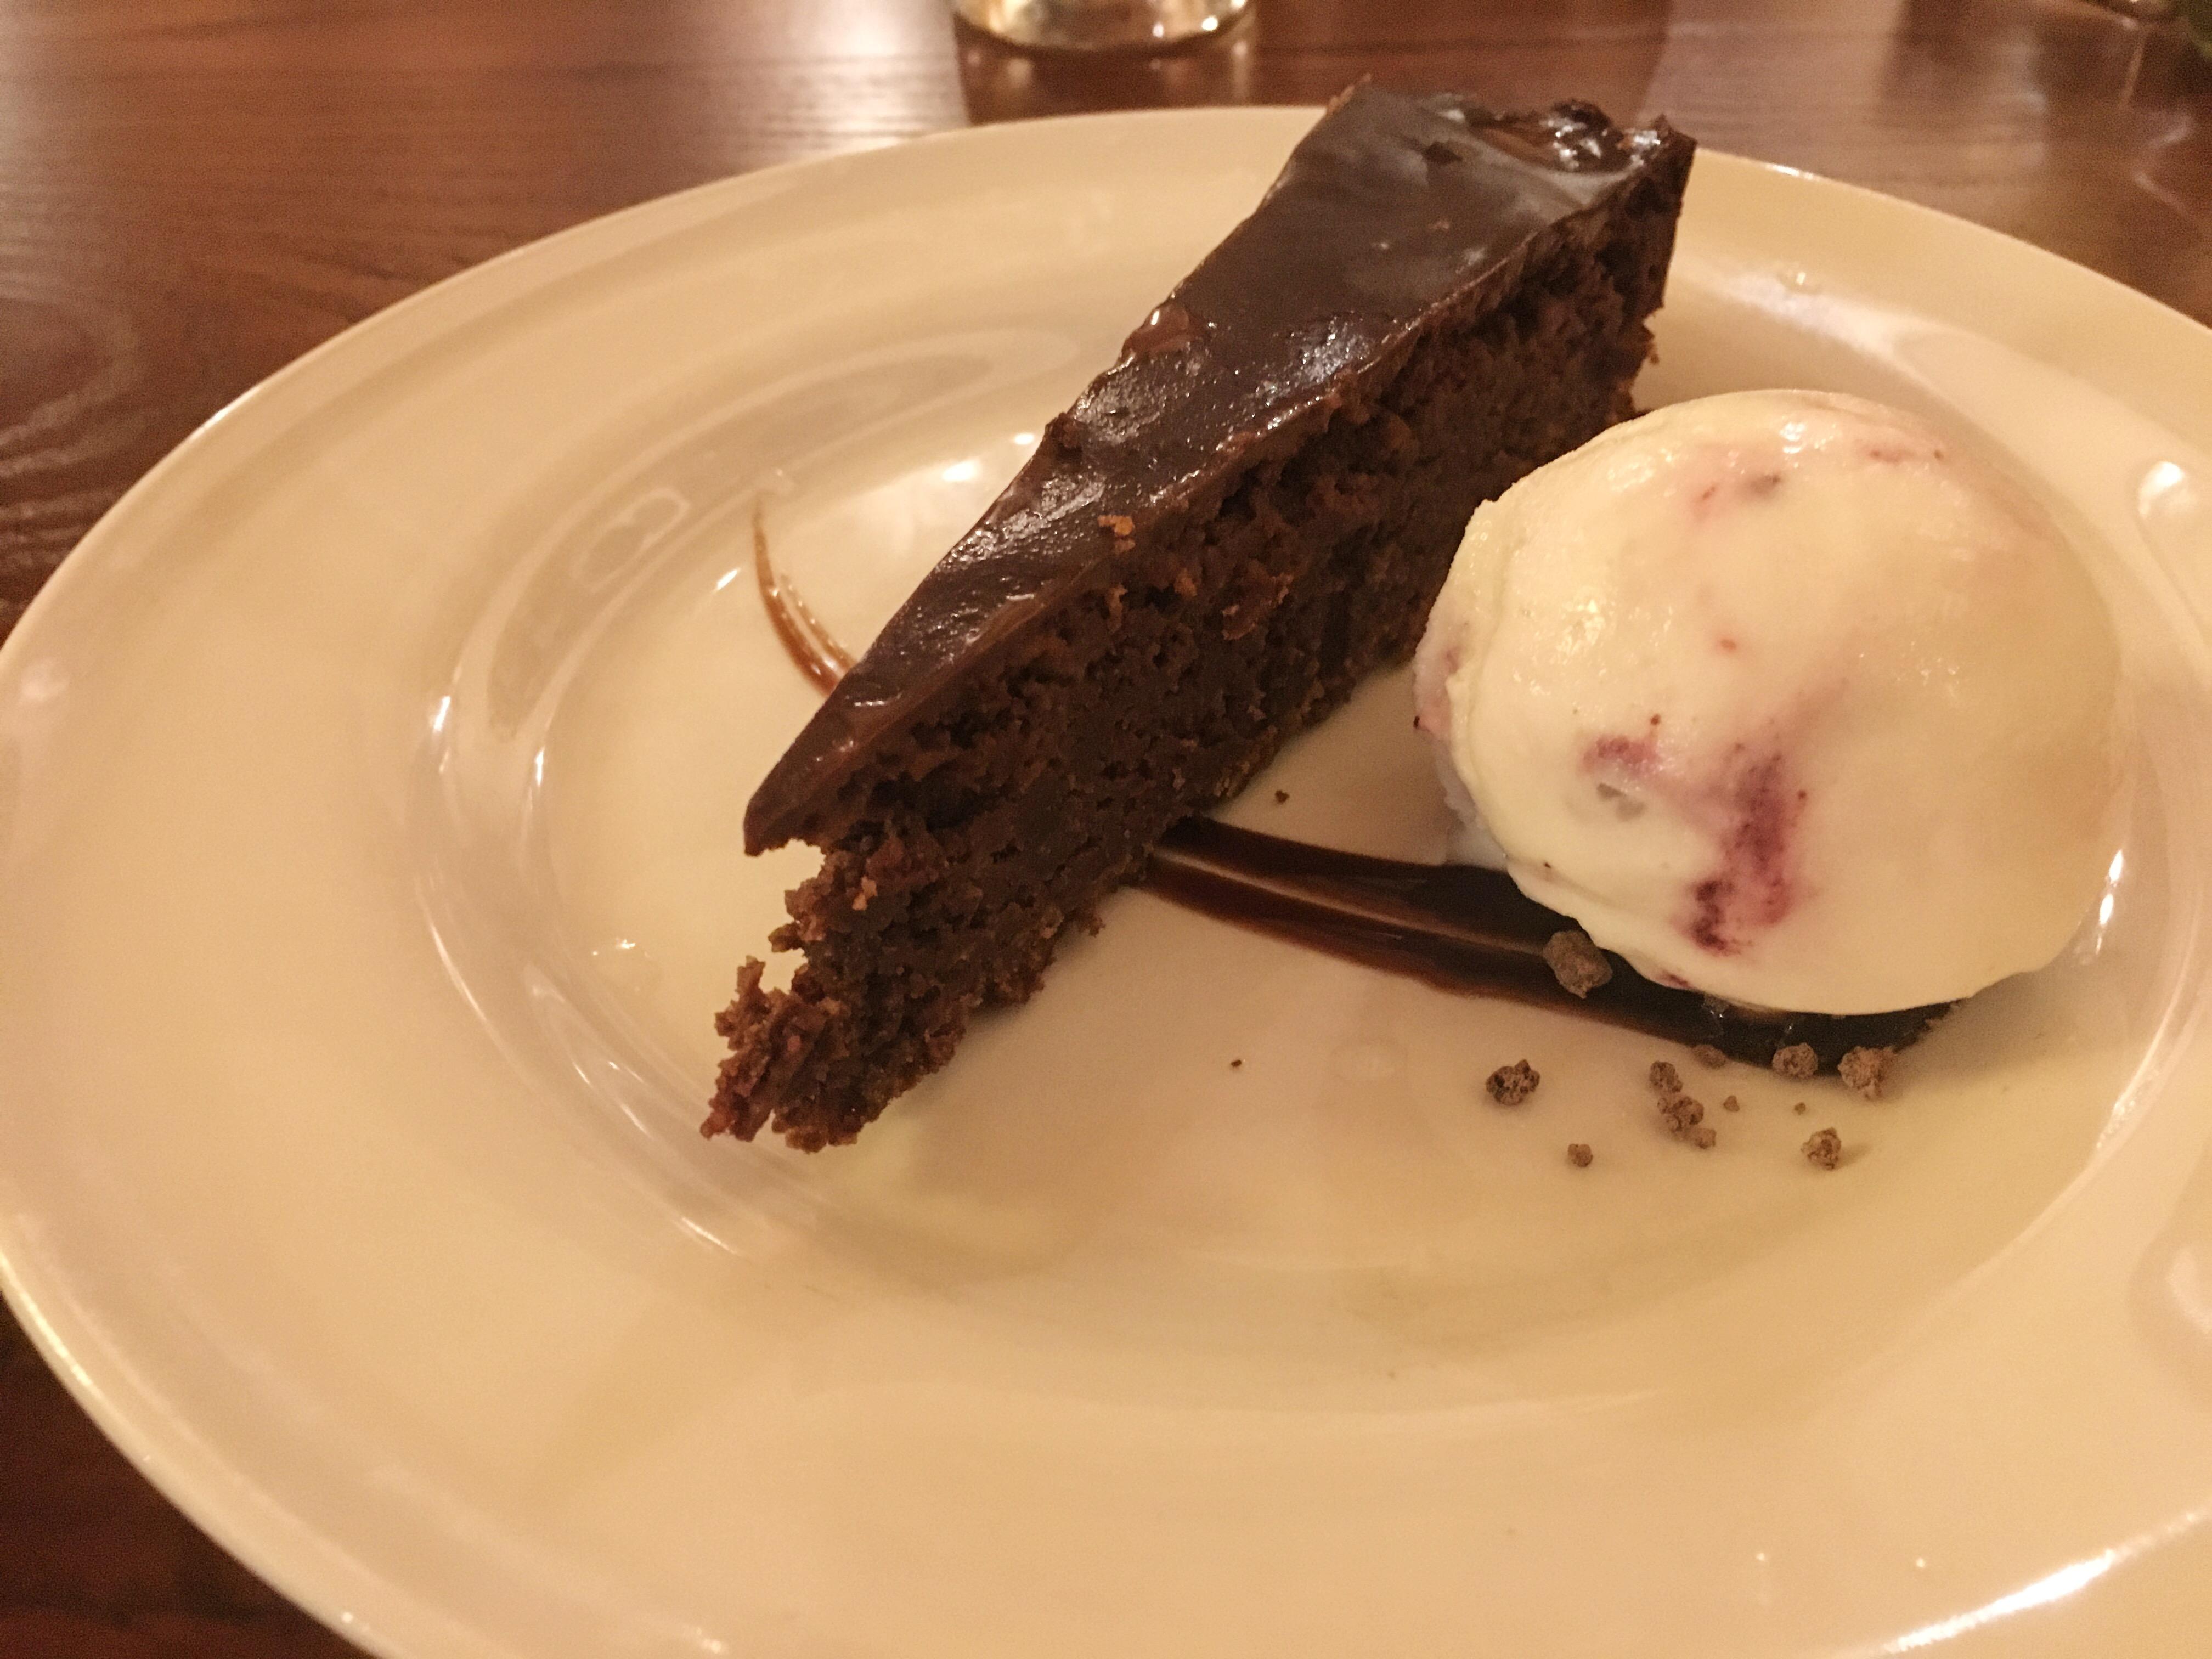 Chocolate torte with ice cream